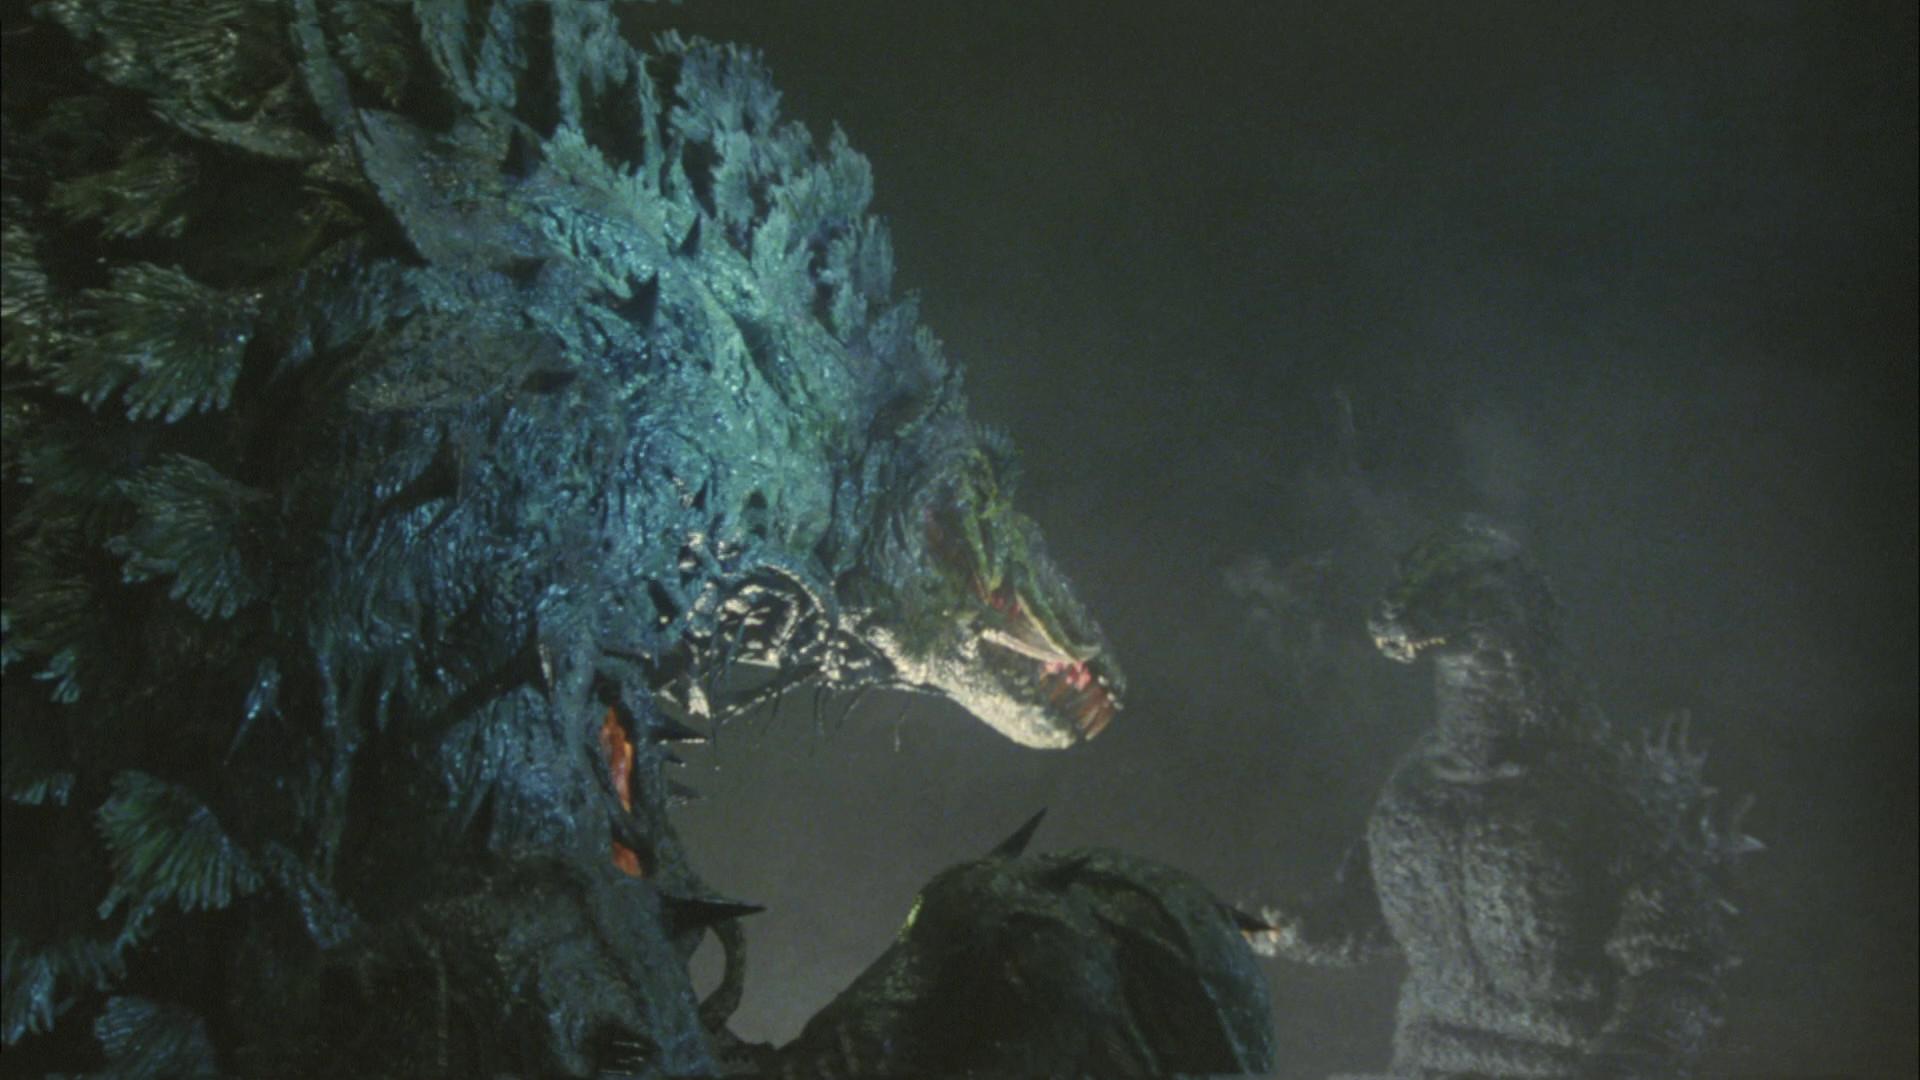 Res: 1920x1080, Godzilla (1954), Radon (Rodan), Mothra, Godzilla vs. Biollante, Godzilla:  Final Wars - Page 23 - Blu-ray Forum